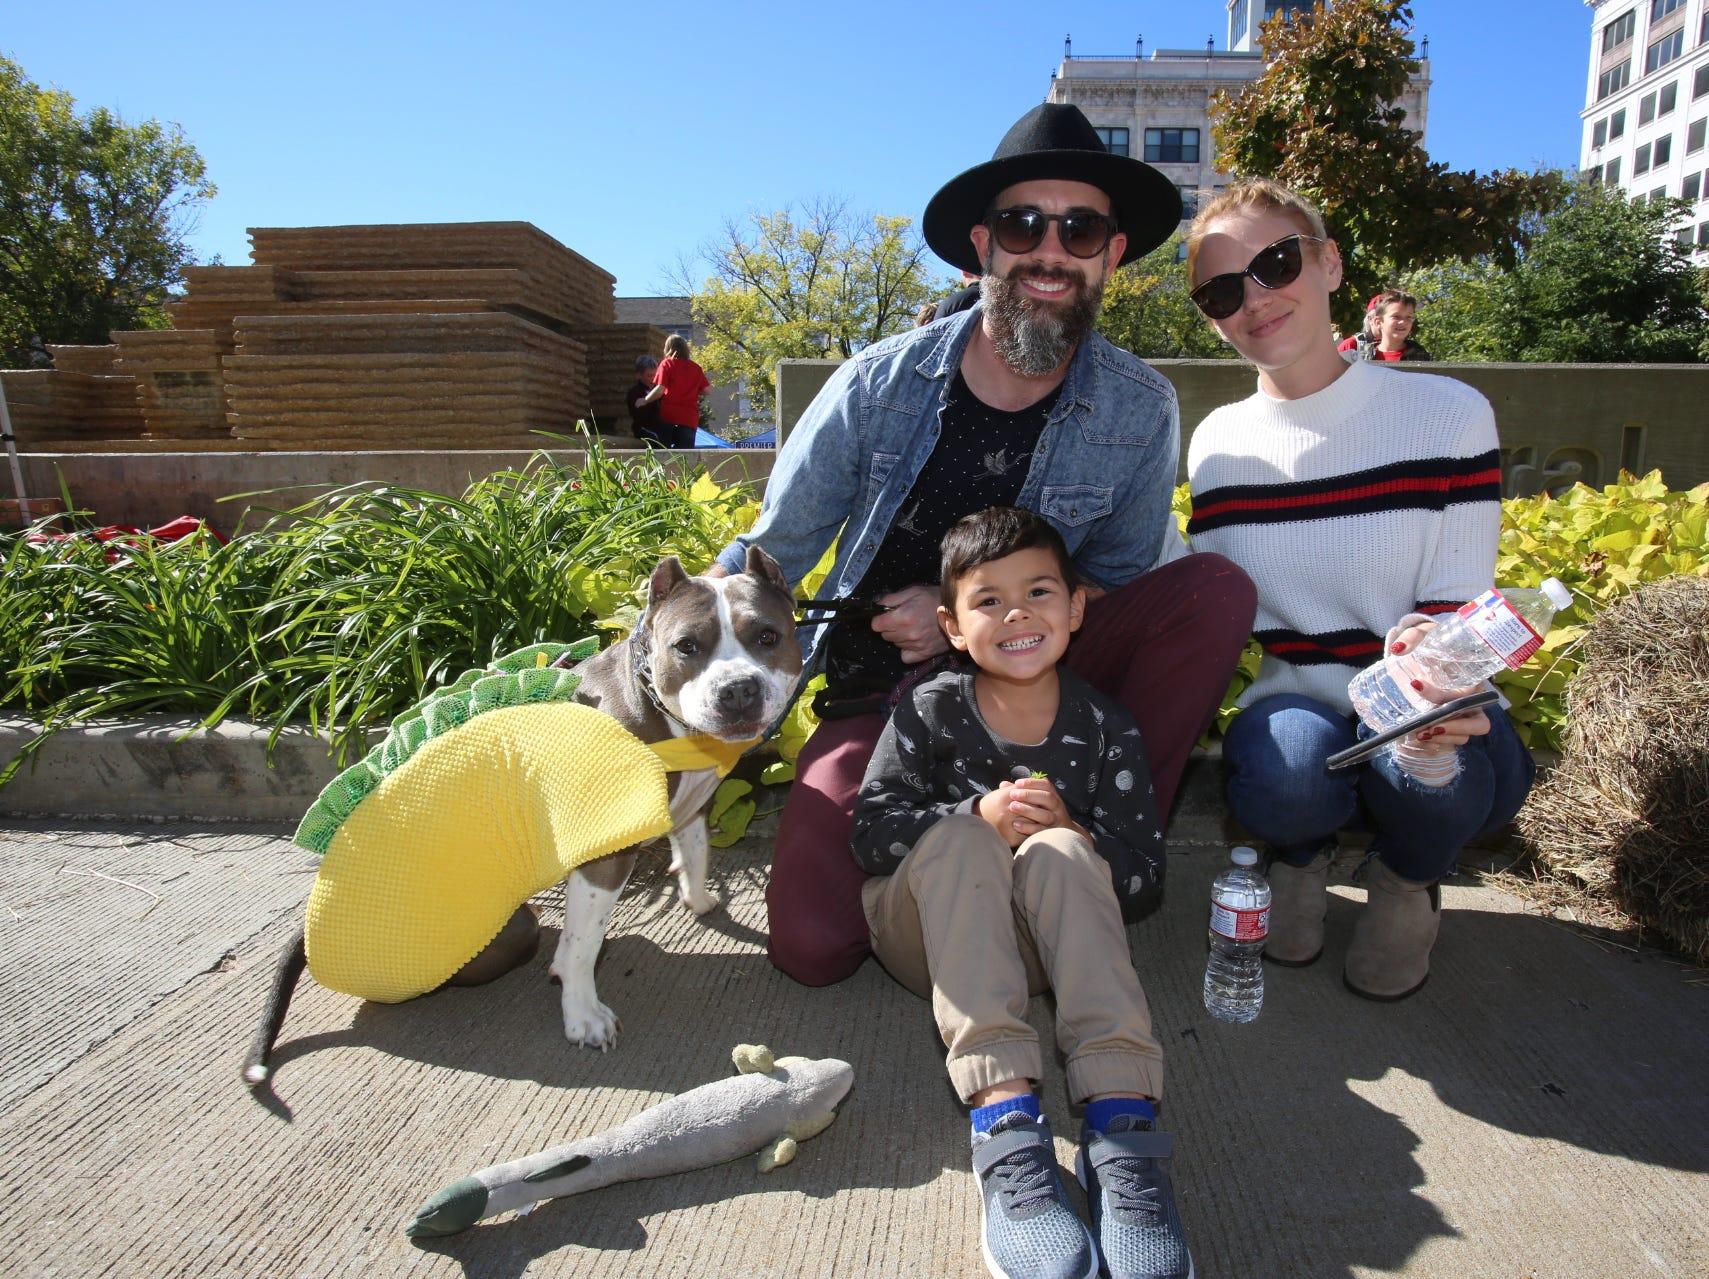 Doug and Maddox Braudway, Nikki Mann, and Matilda